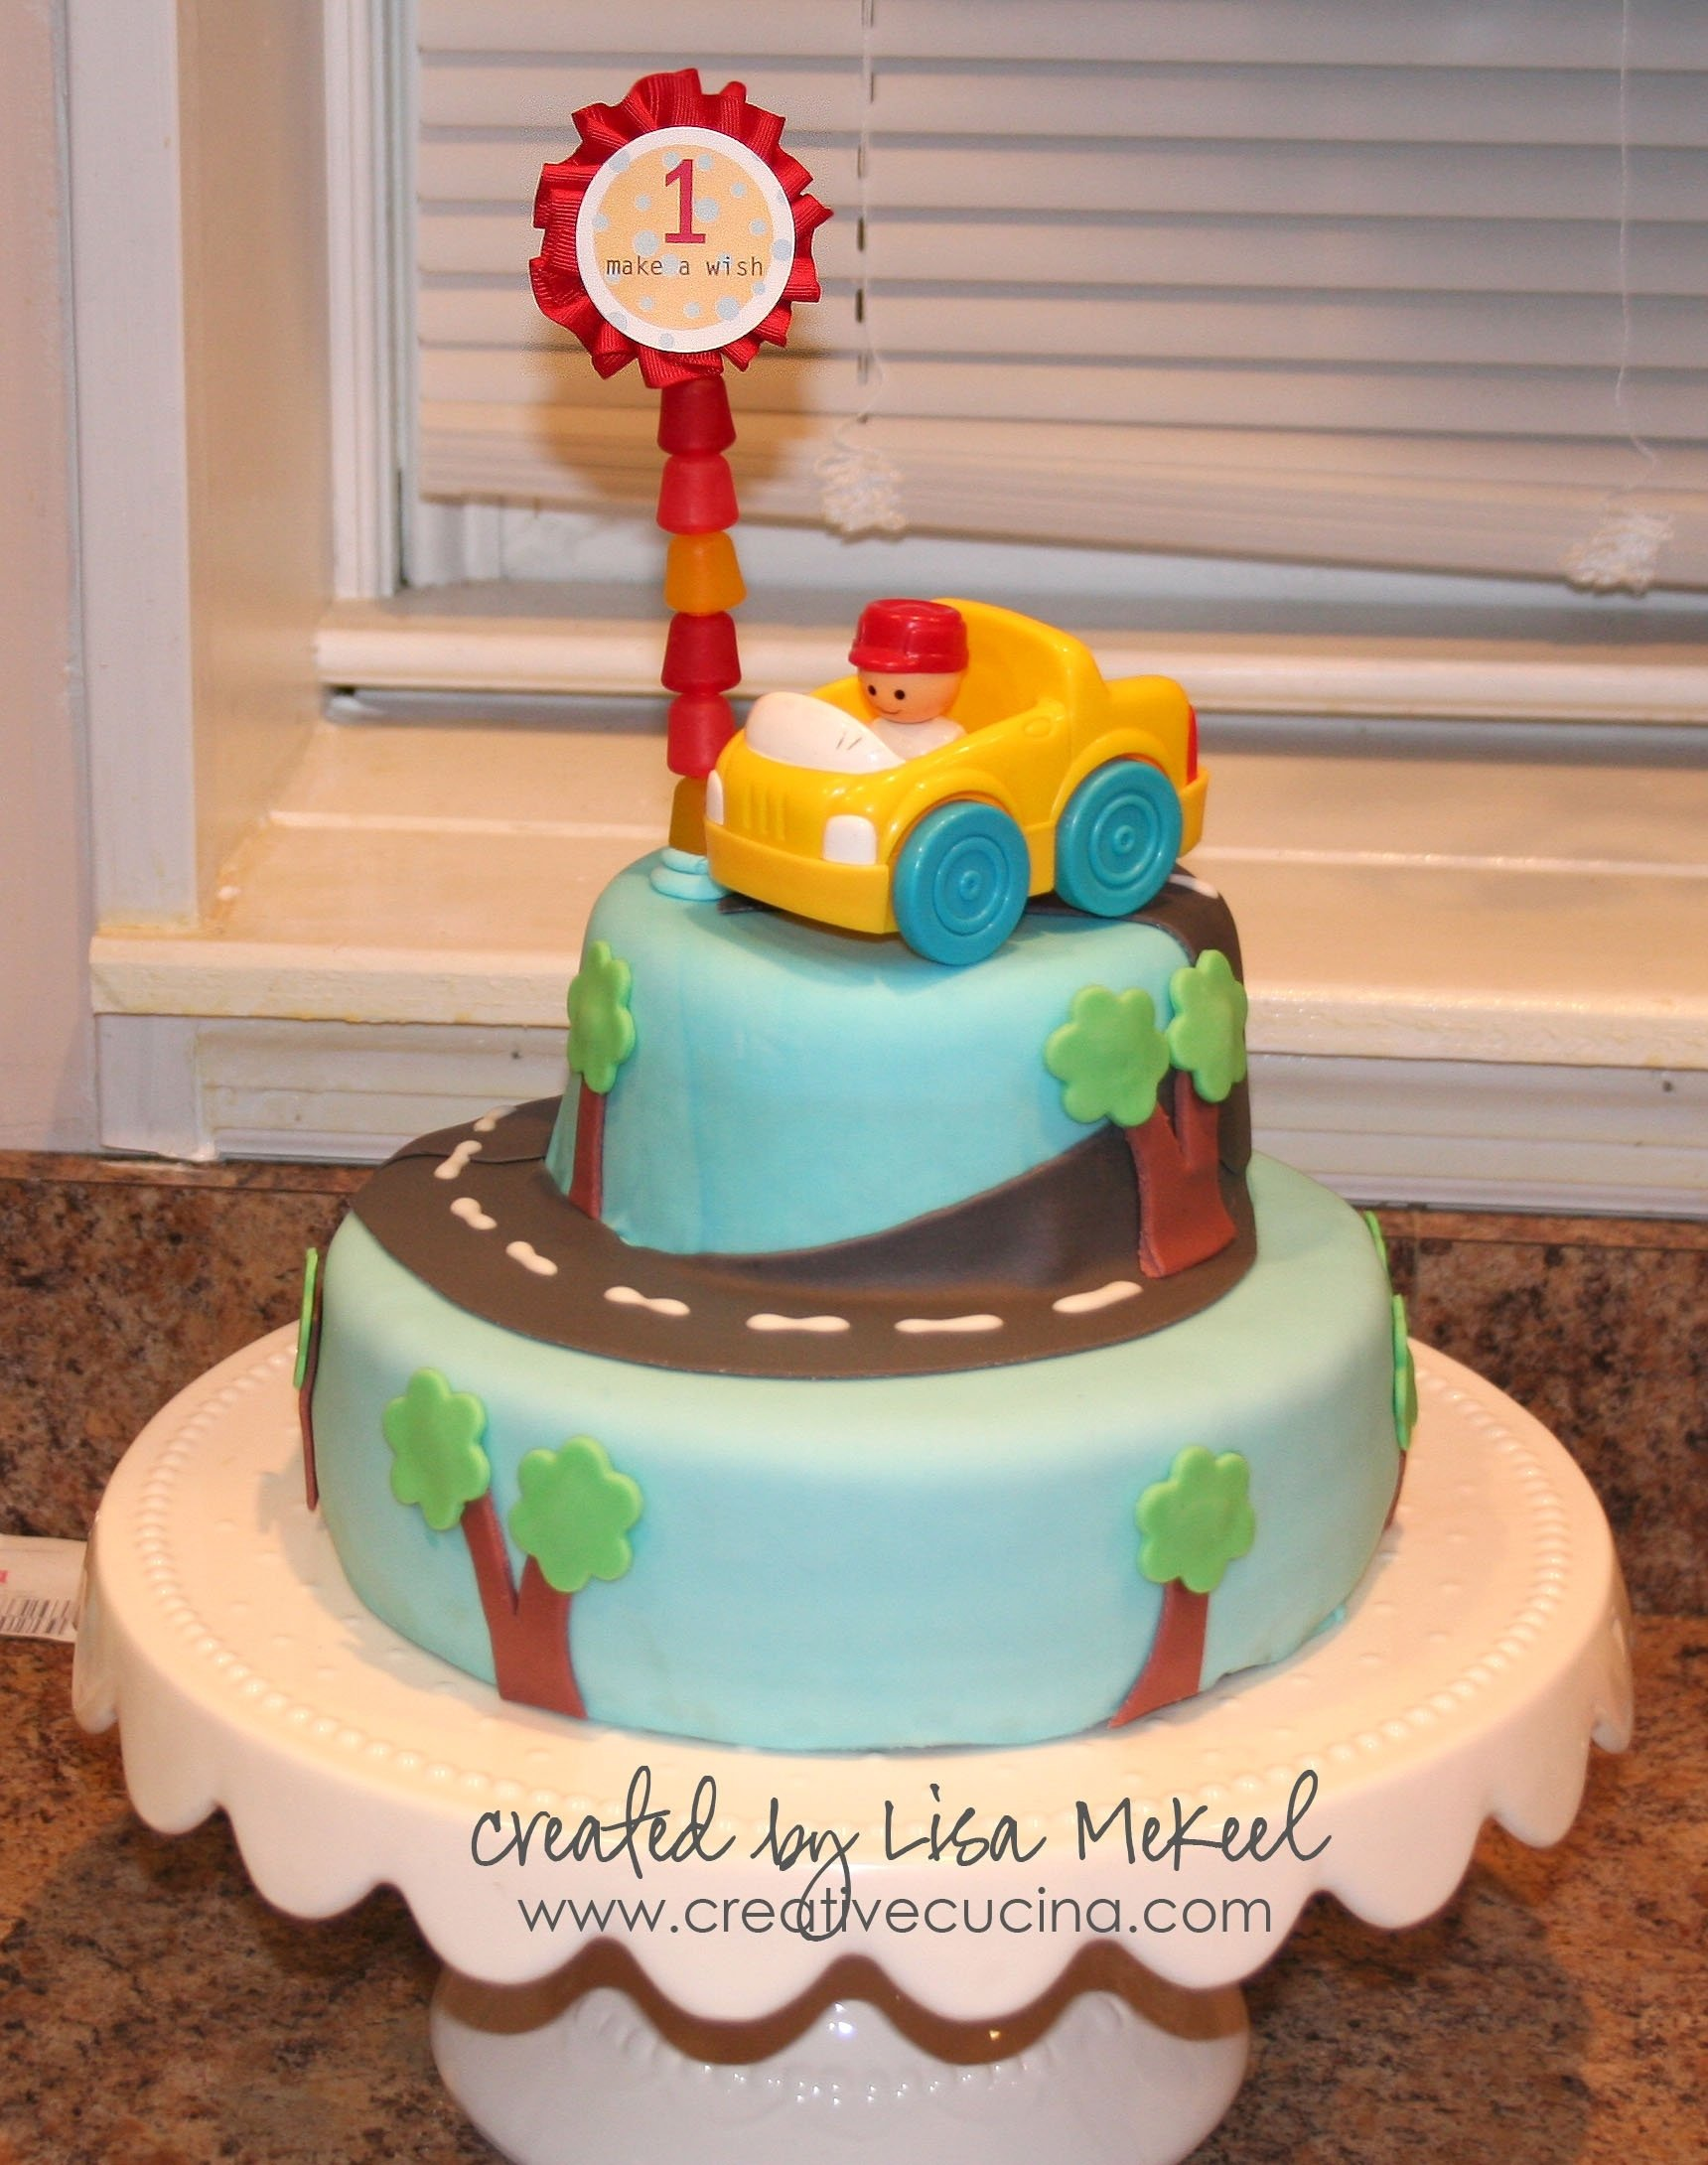 10 Great 1st Birthday Cake Ideas For Boys